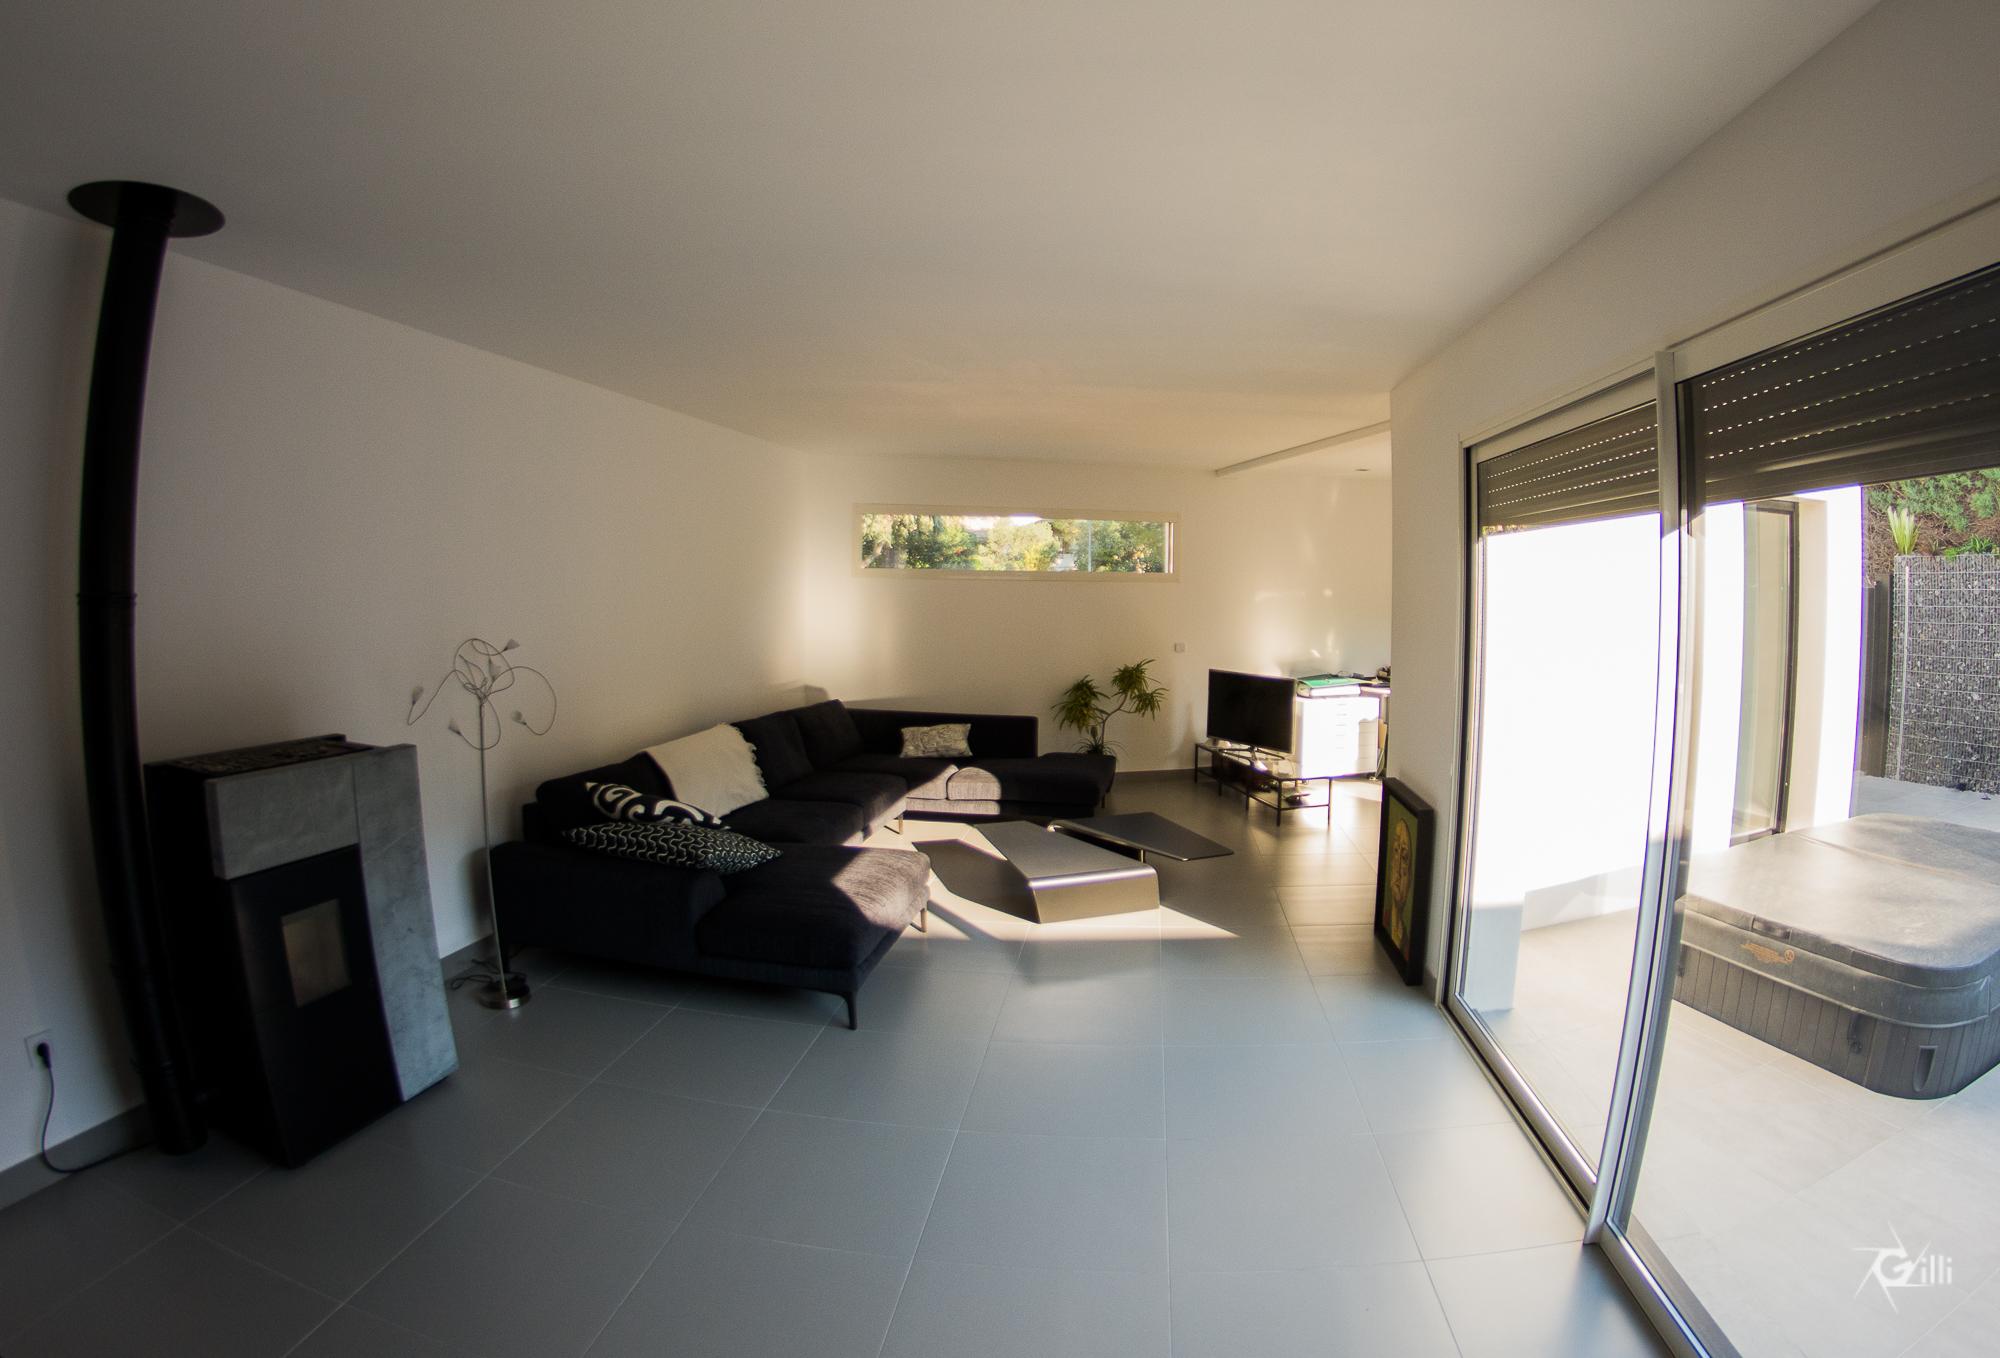 photos home staging gilbert wayenborgh gilli. Black Bedroom Furniture Sets. Home Design Ideas